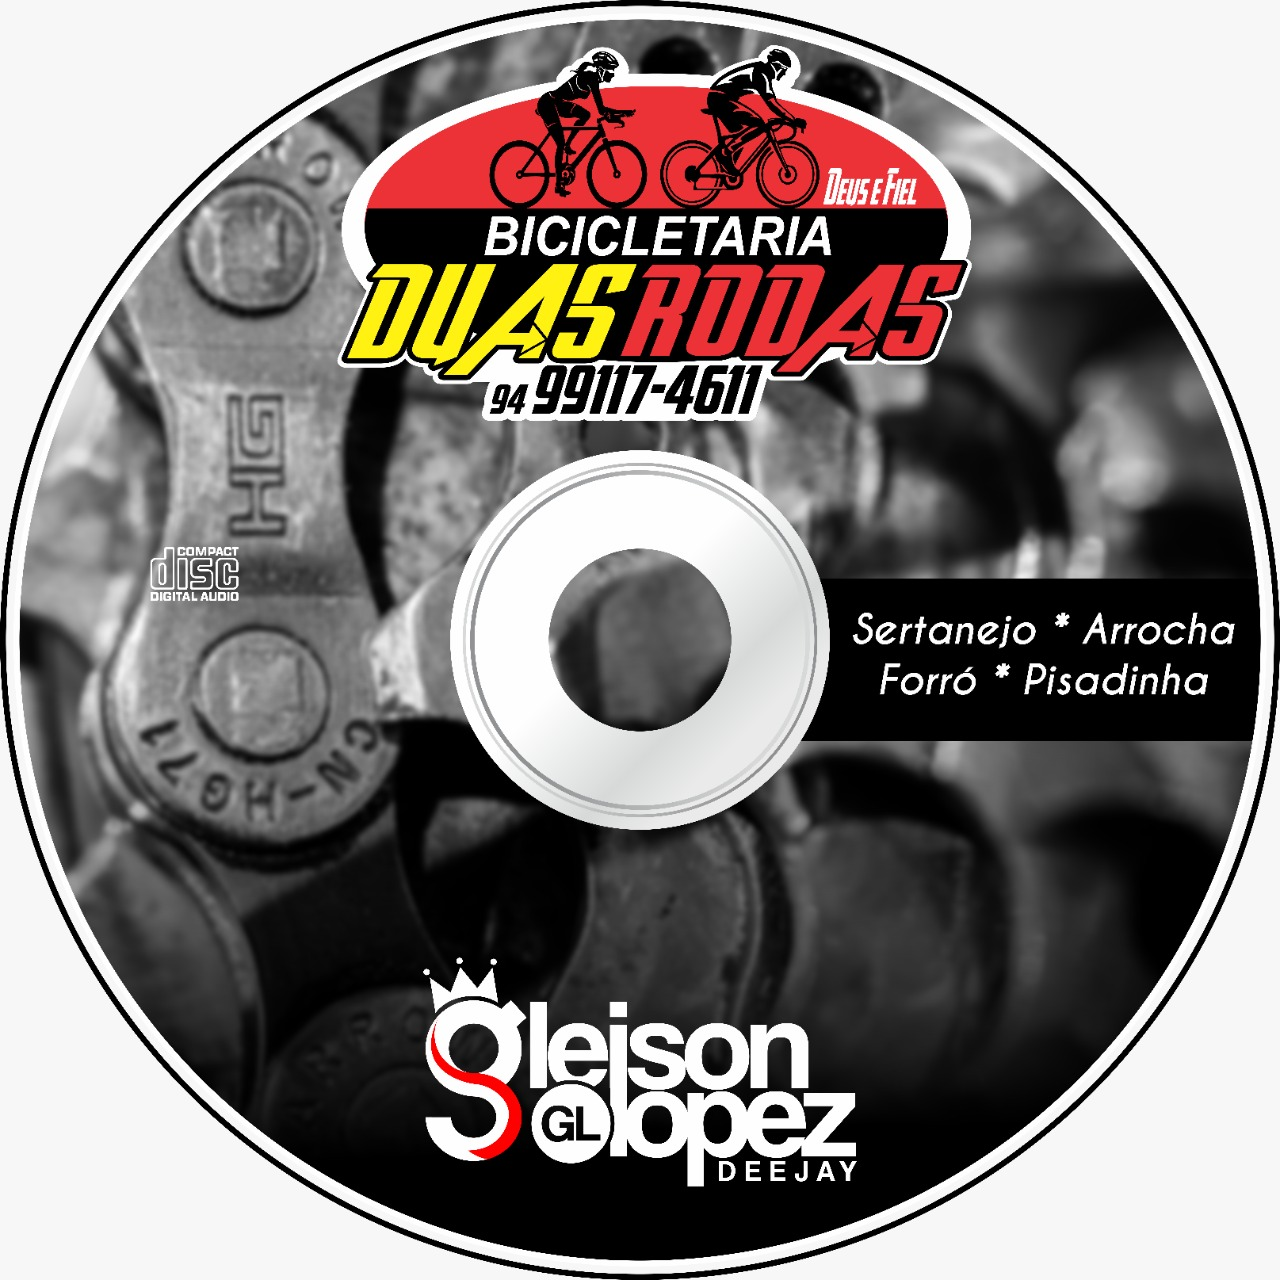 Bicicletaria 2 Rodas Parauapebas-PA - Gleison Lopez DJ